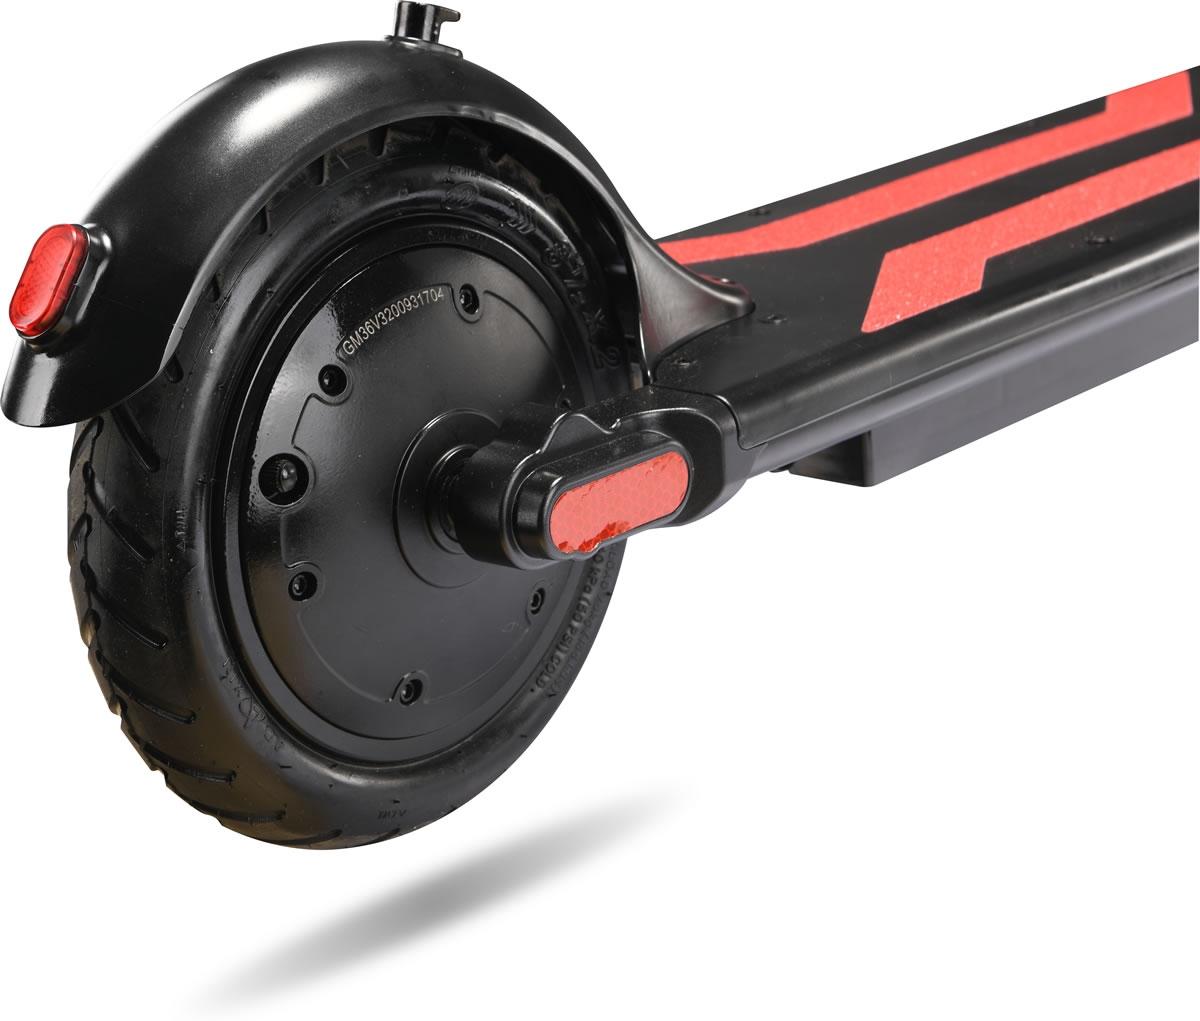 250w brushless motor